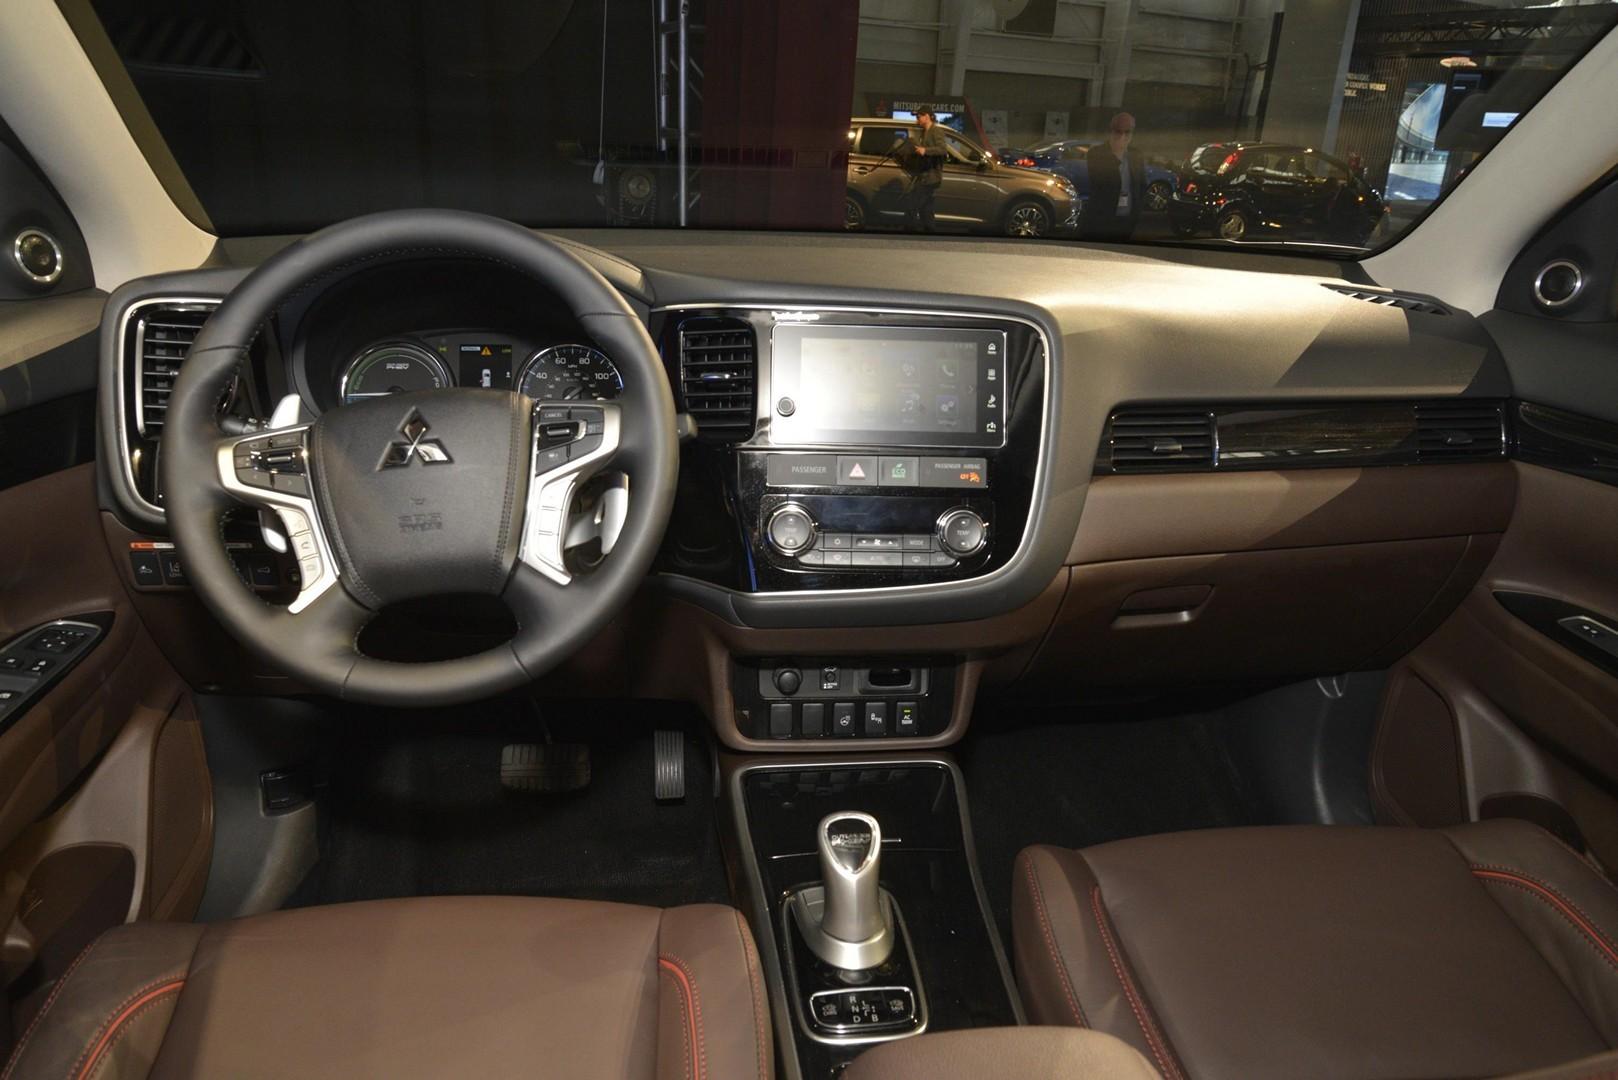 2017 Outlander PHEV Makes US Debut, Mitsubishi Promises SUV Focus - autoevolution